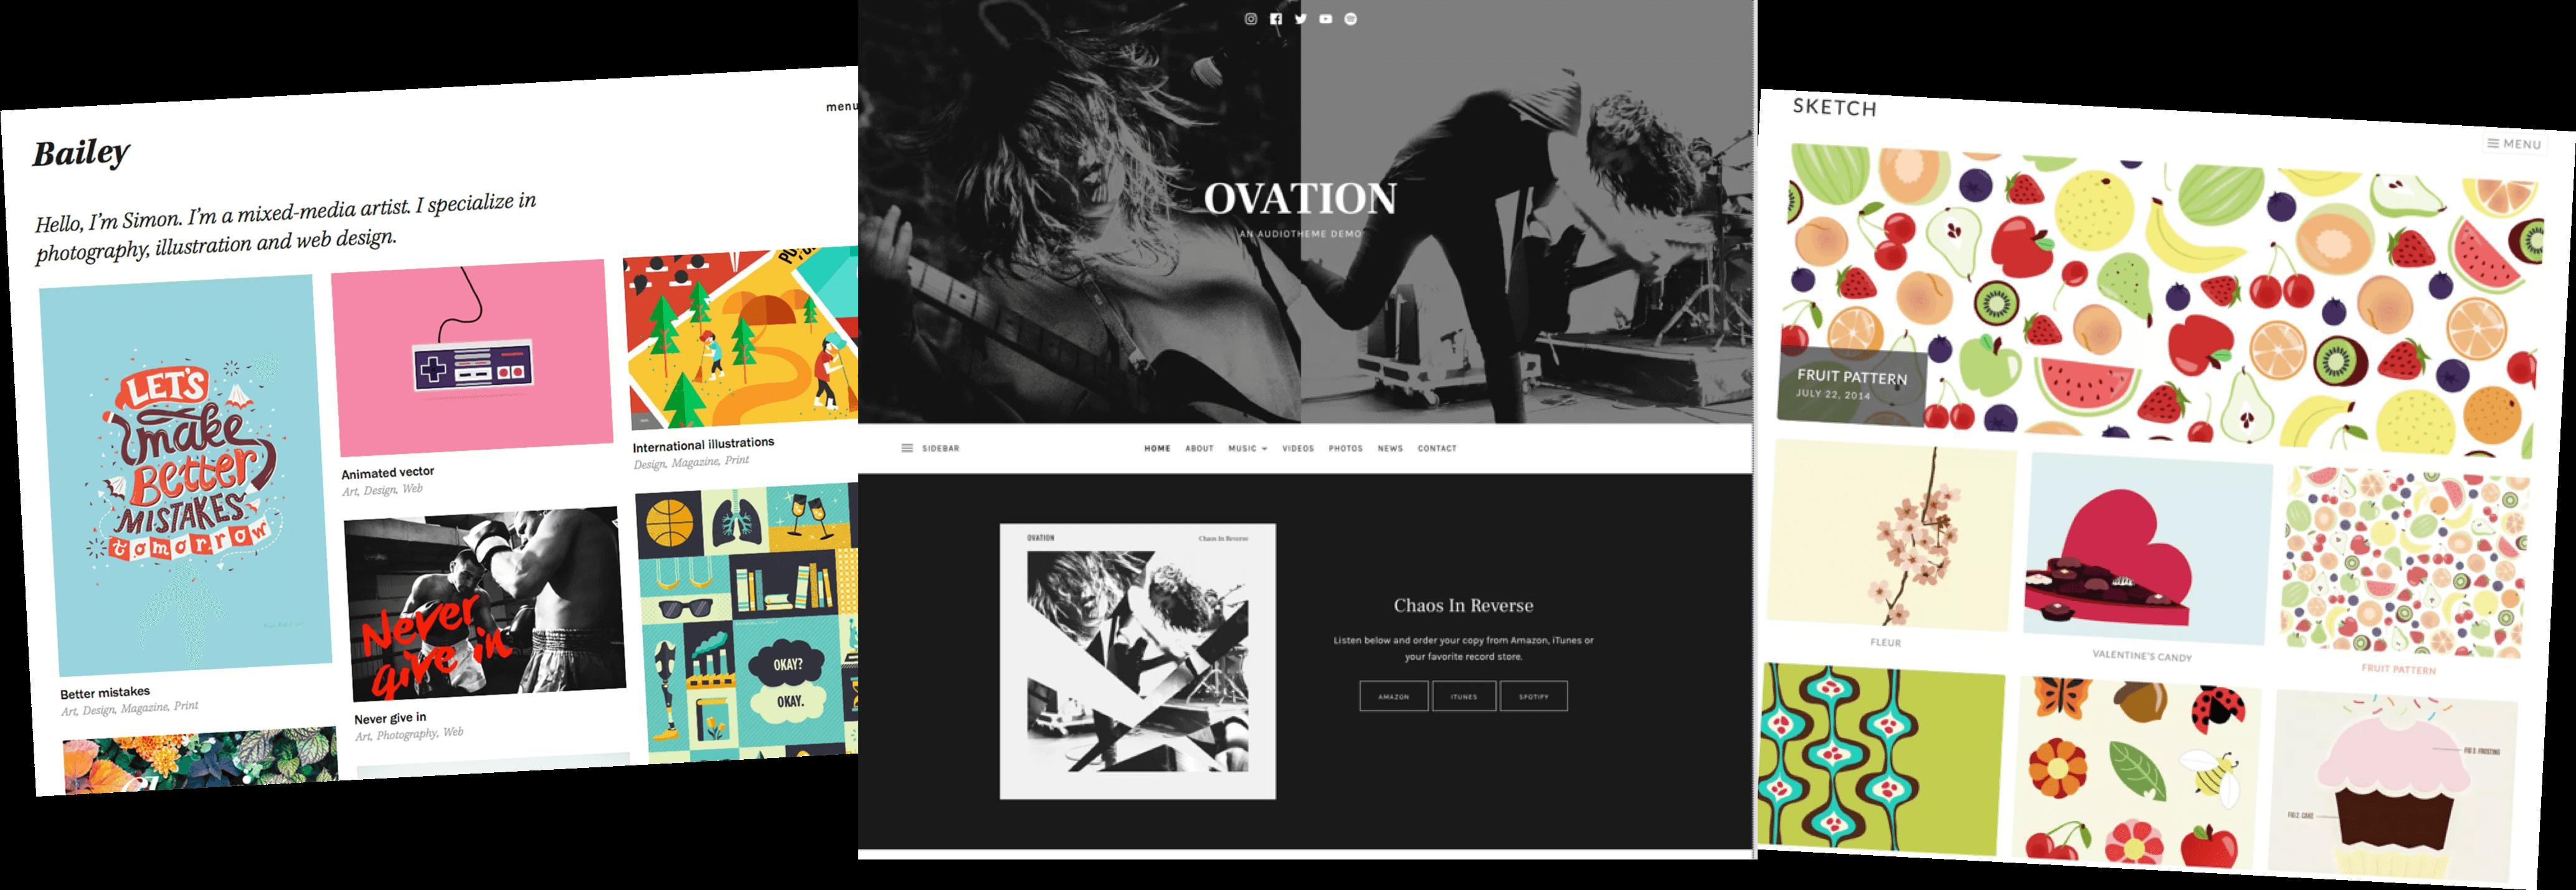 wordpress online portfolio